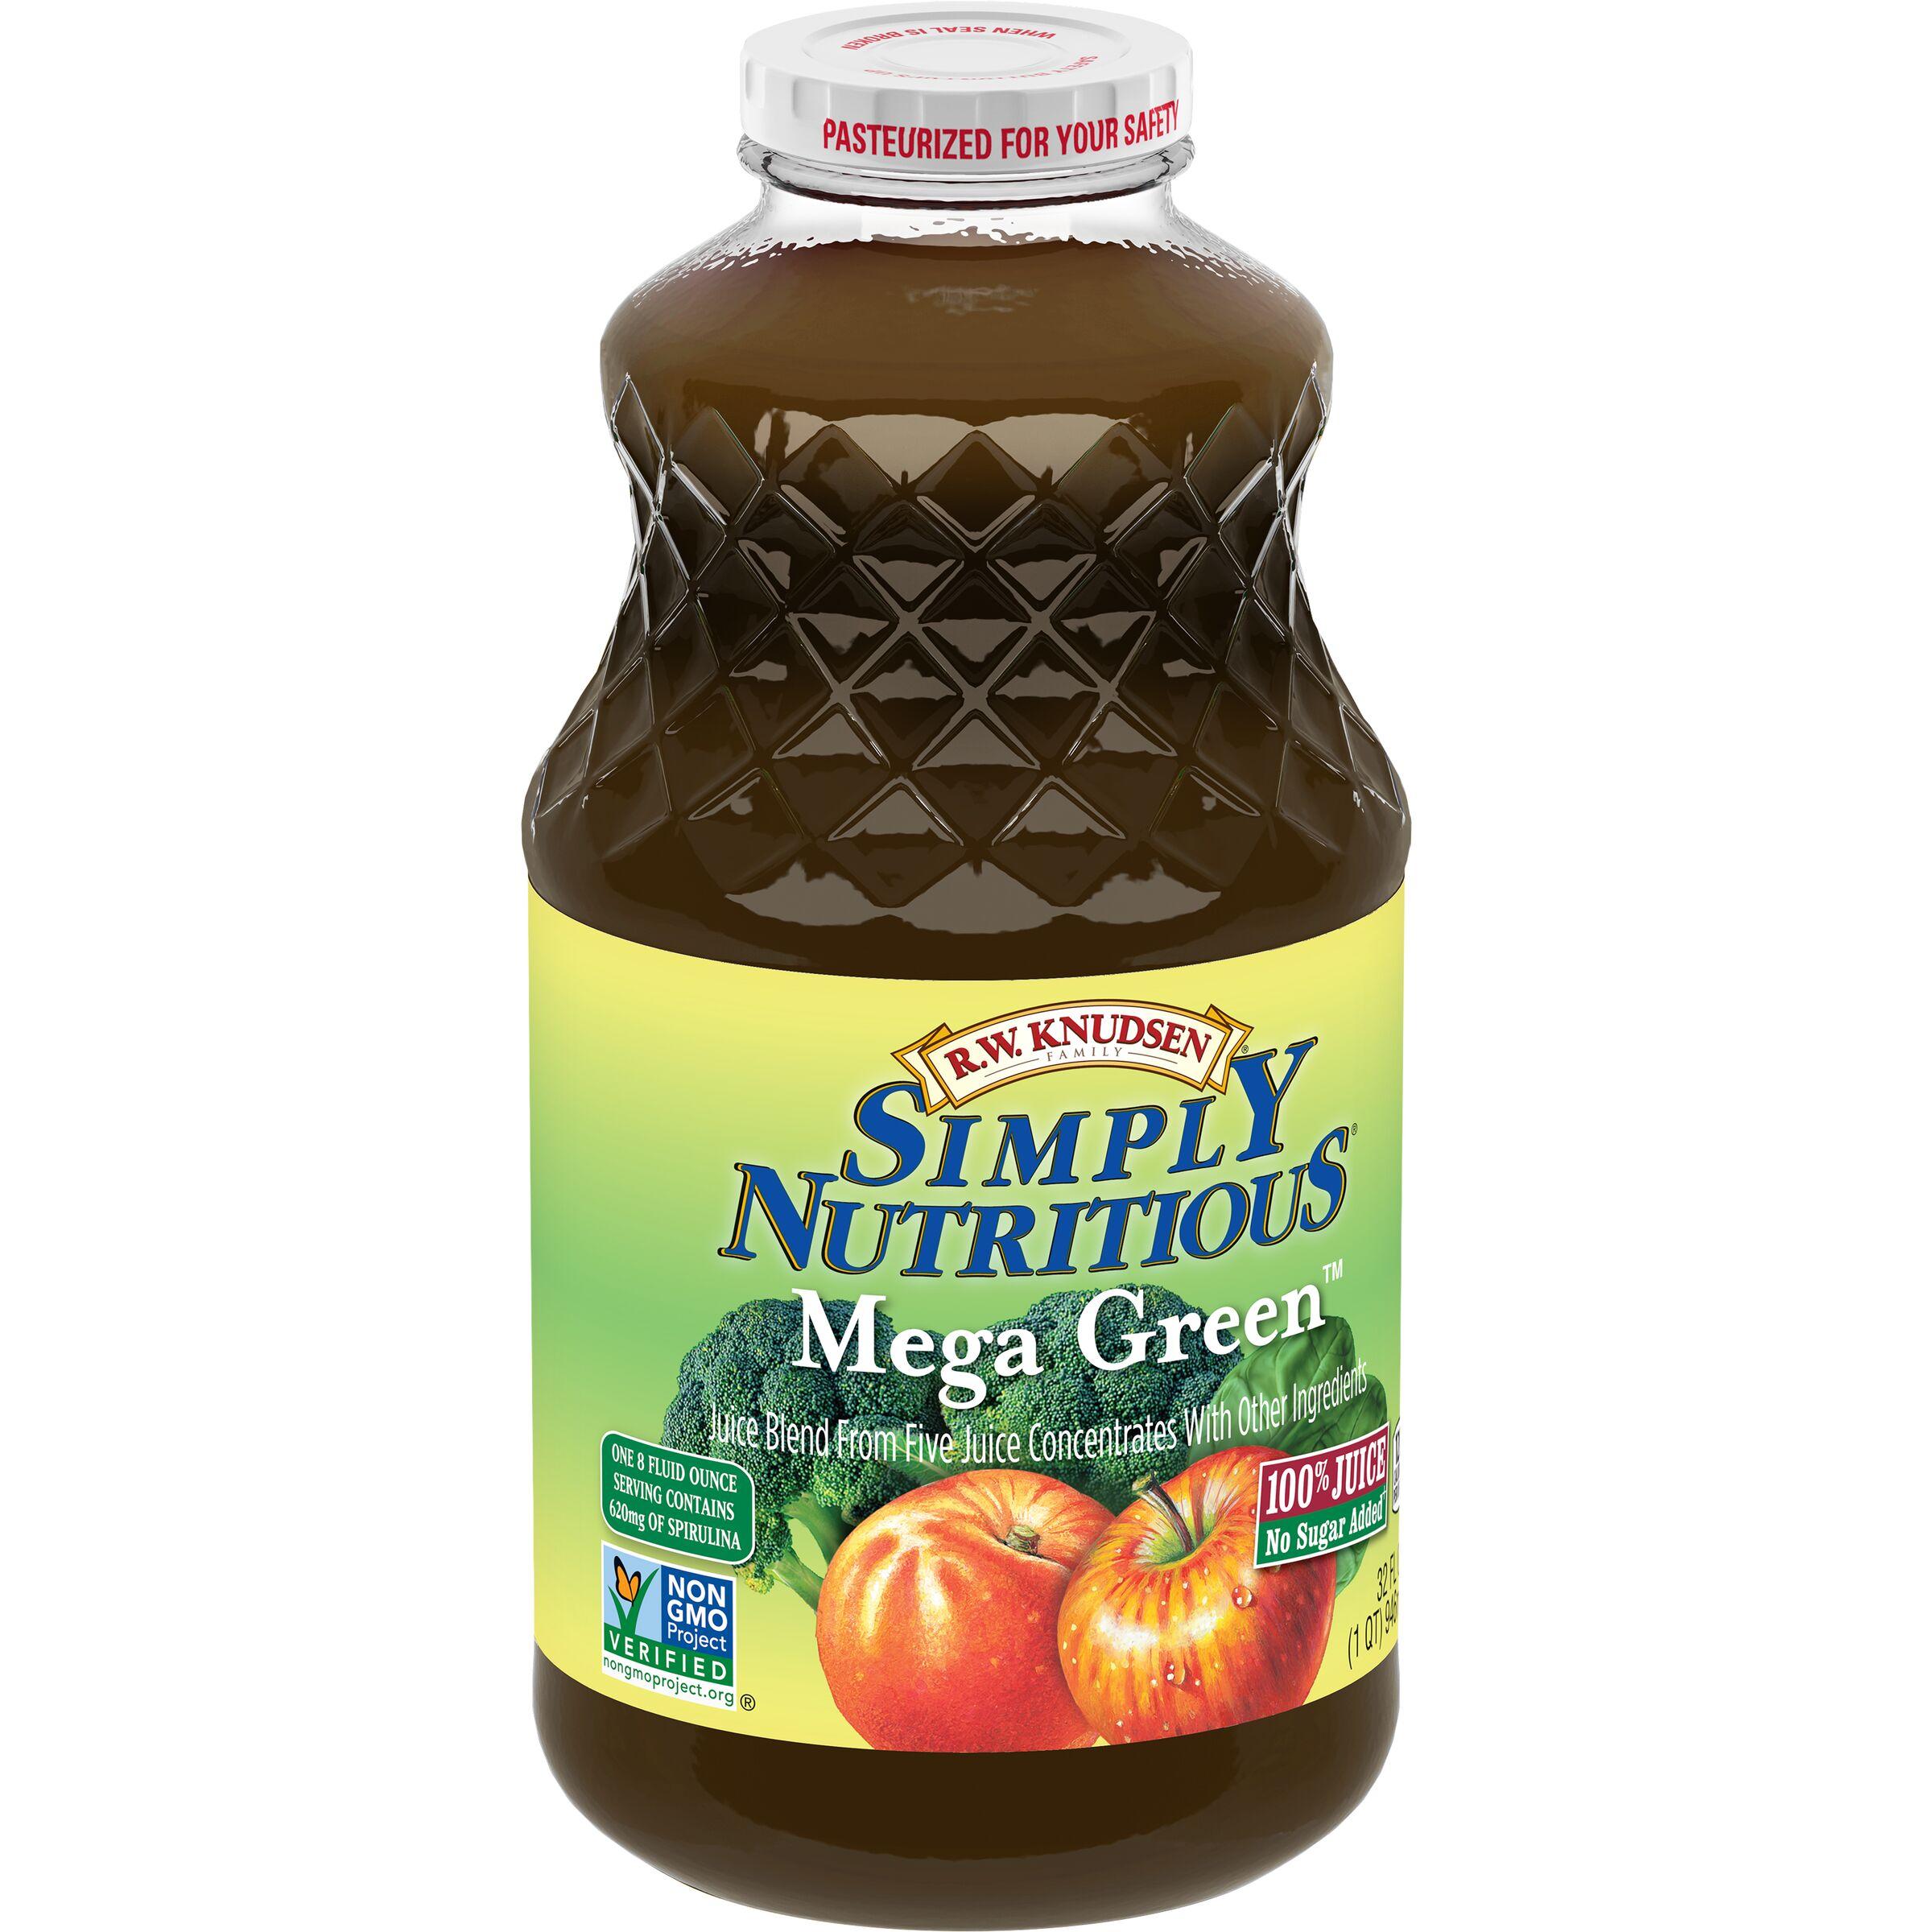 R.W. Knudsen Family Simply Nutritious Mega Green Juice Blend